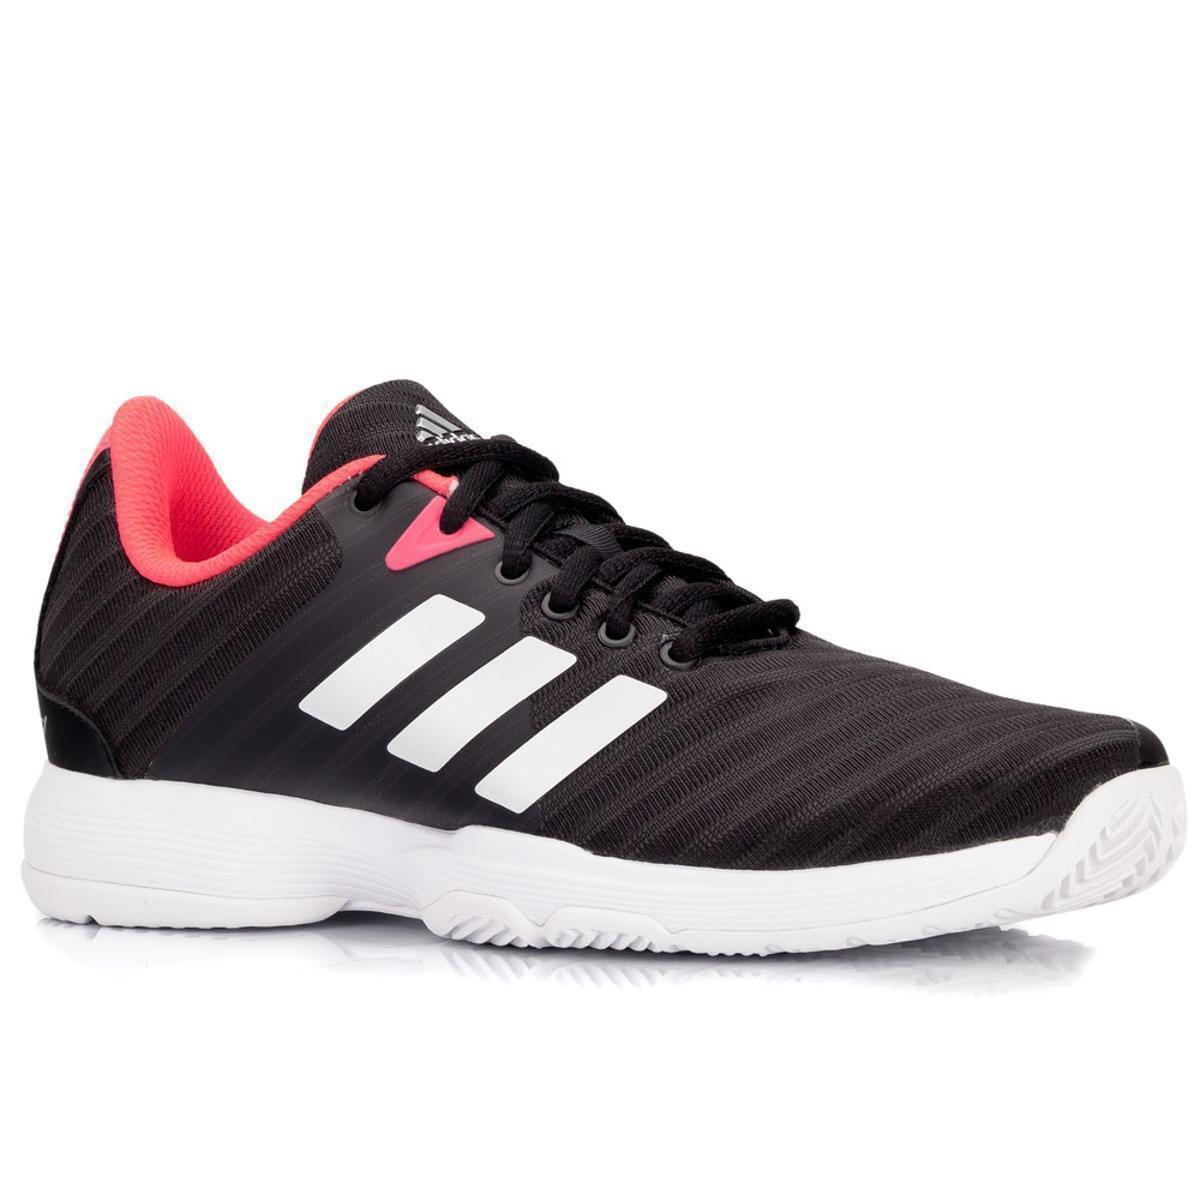 Tênis Feminino Adidas Adidas Court Preto Barricade Tênis Barricade Court Prata e Feminino e Preto gBxqgwFA